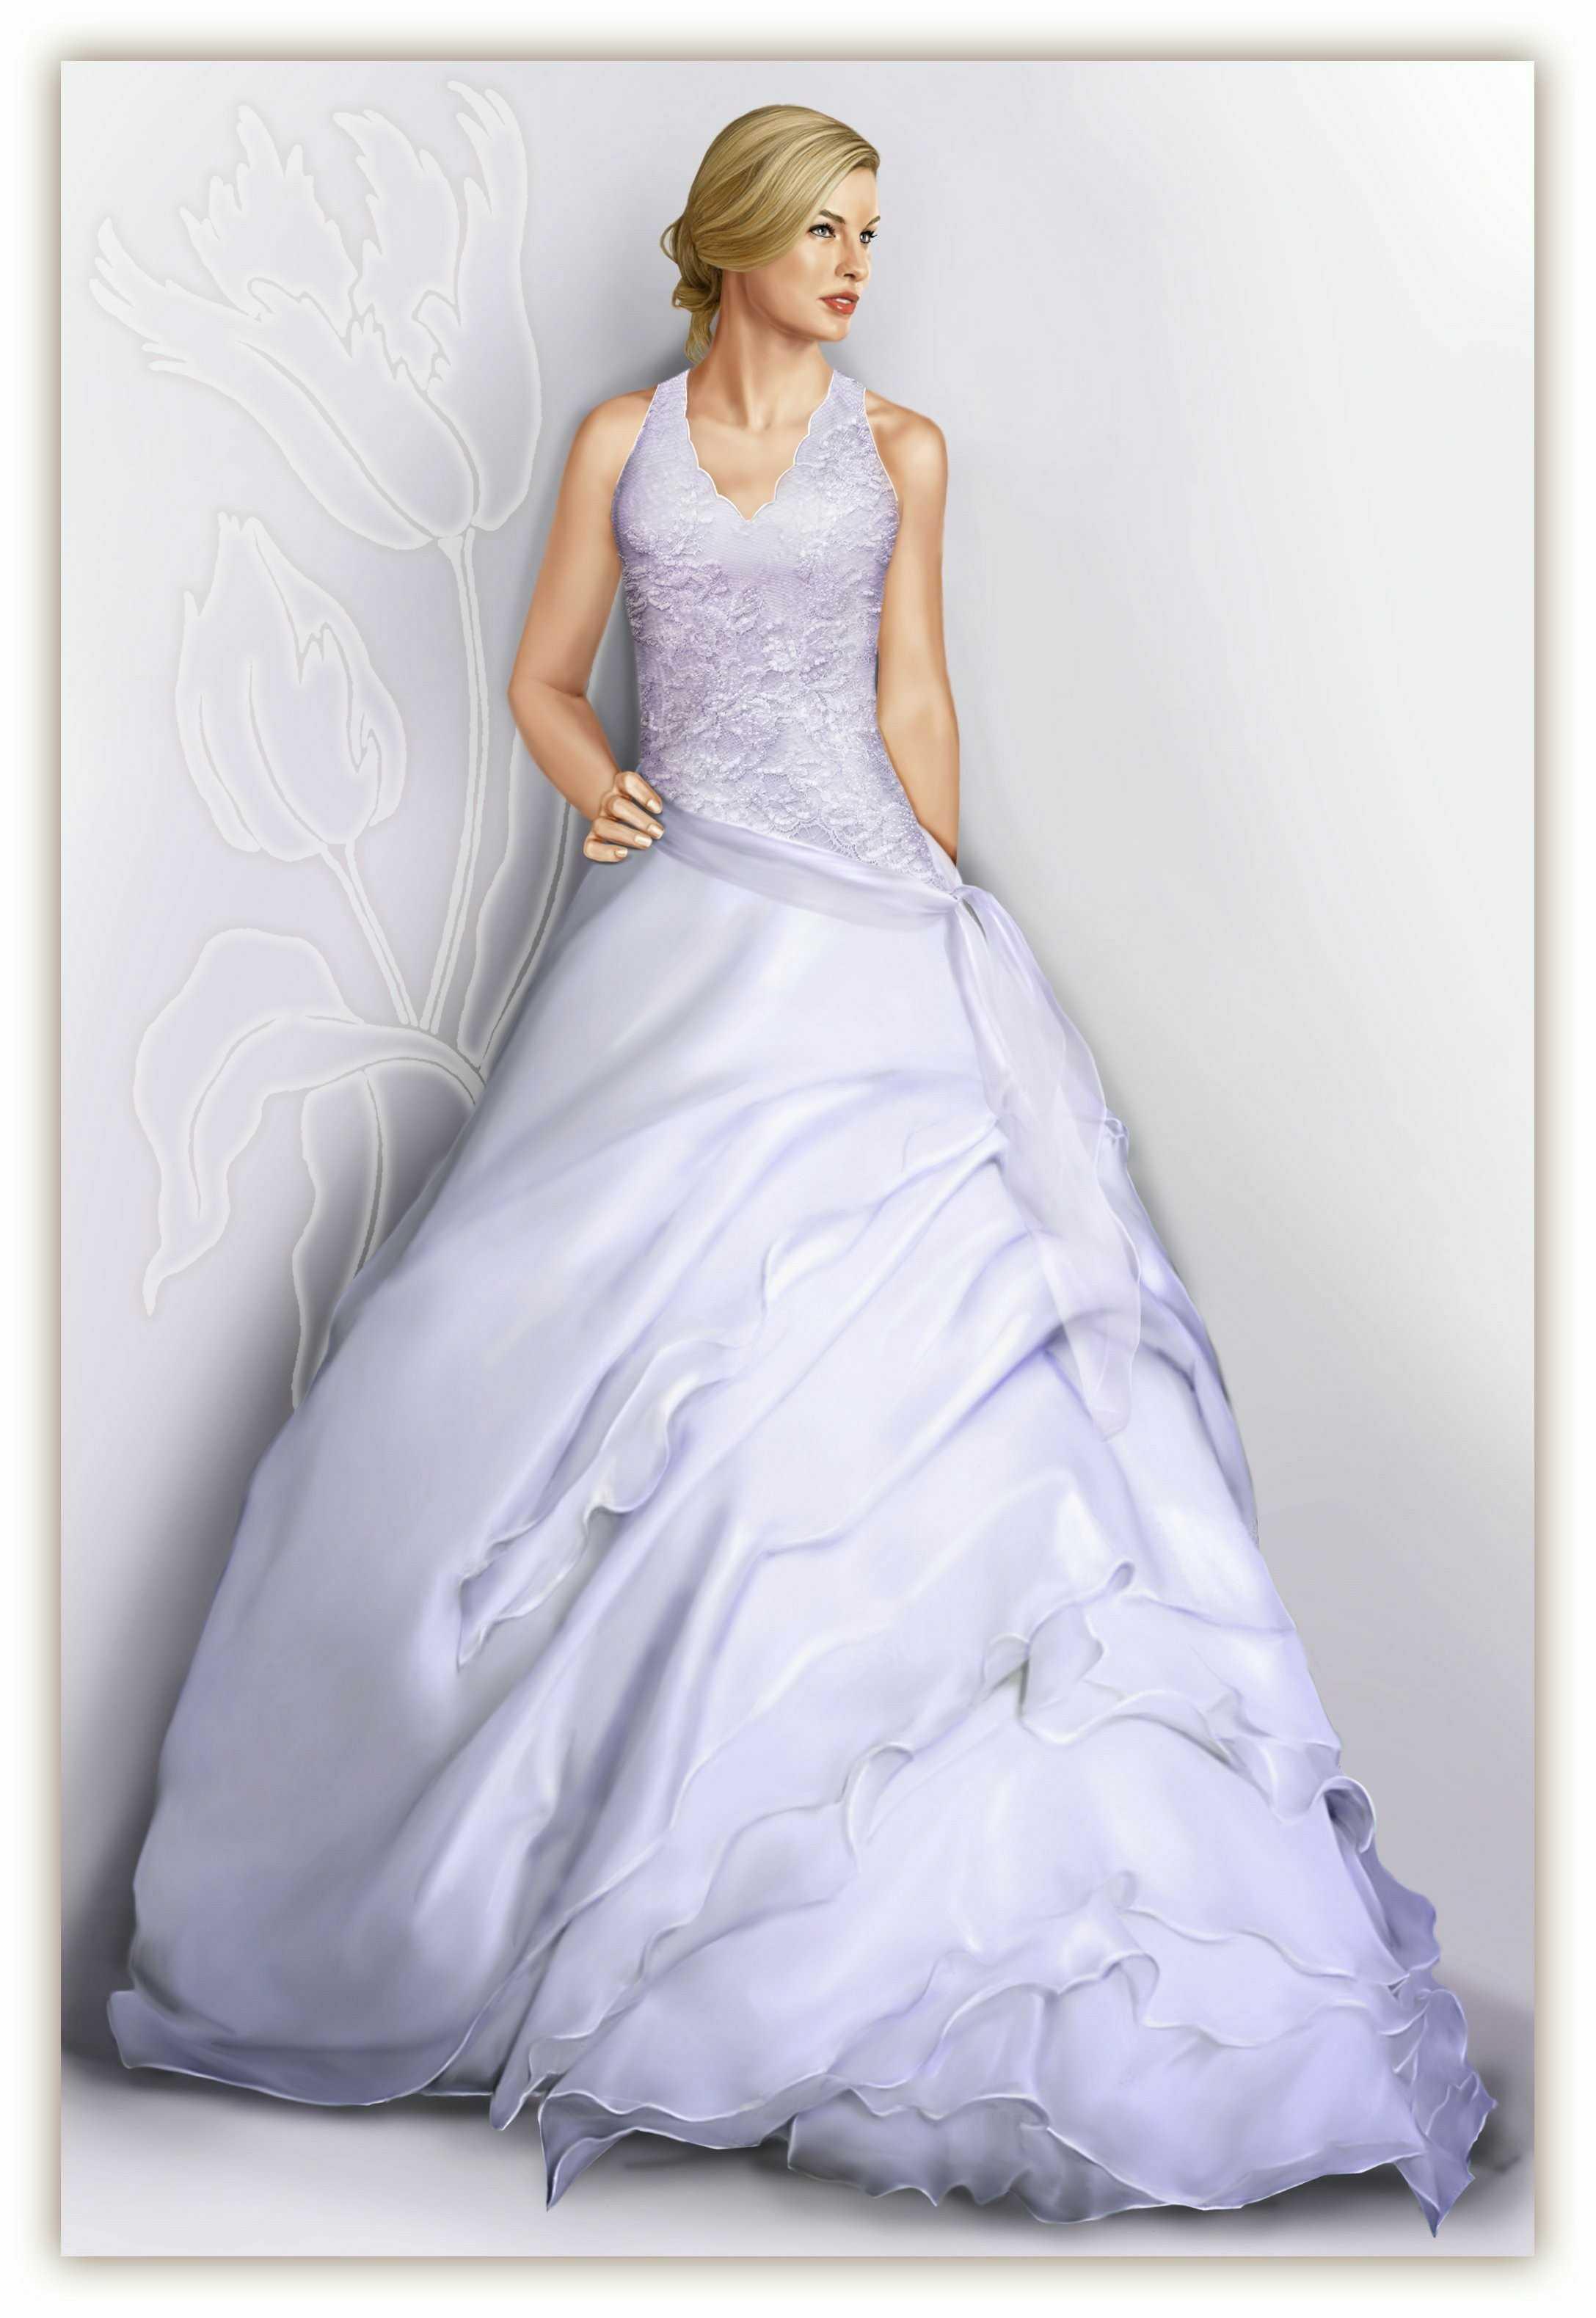 Wedding Dress With Multi Layered Assymetrical Skirt